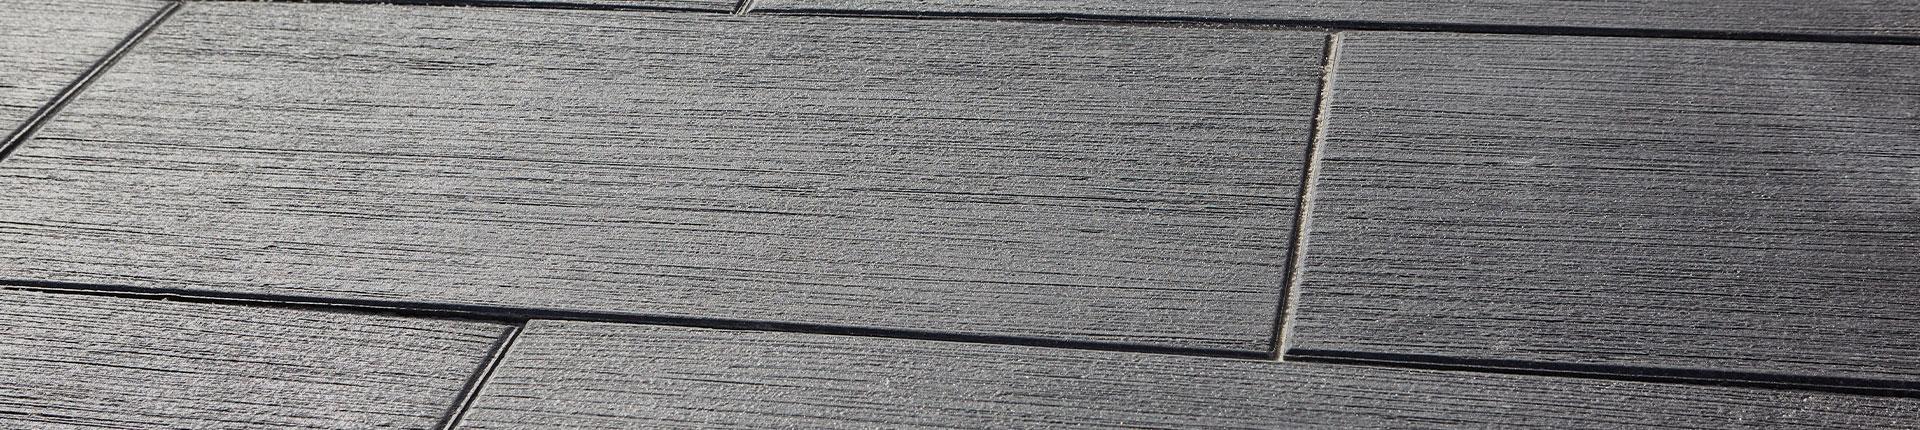 Terrassenplatten_1920x430px